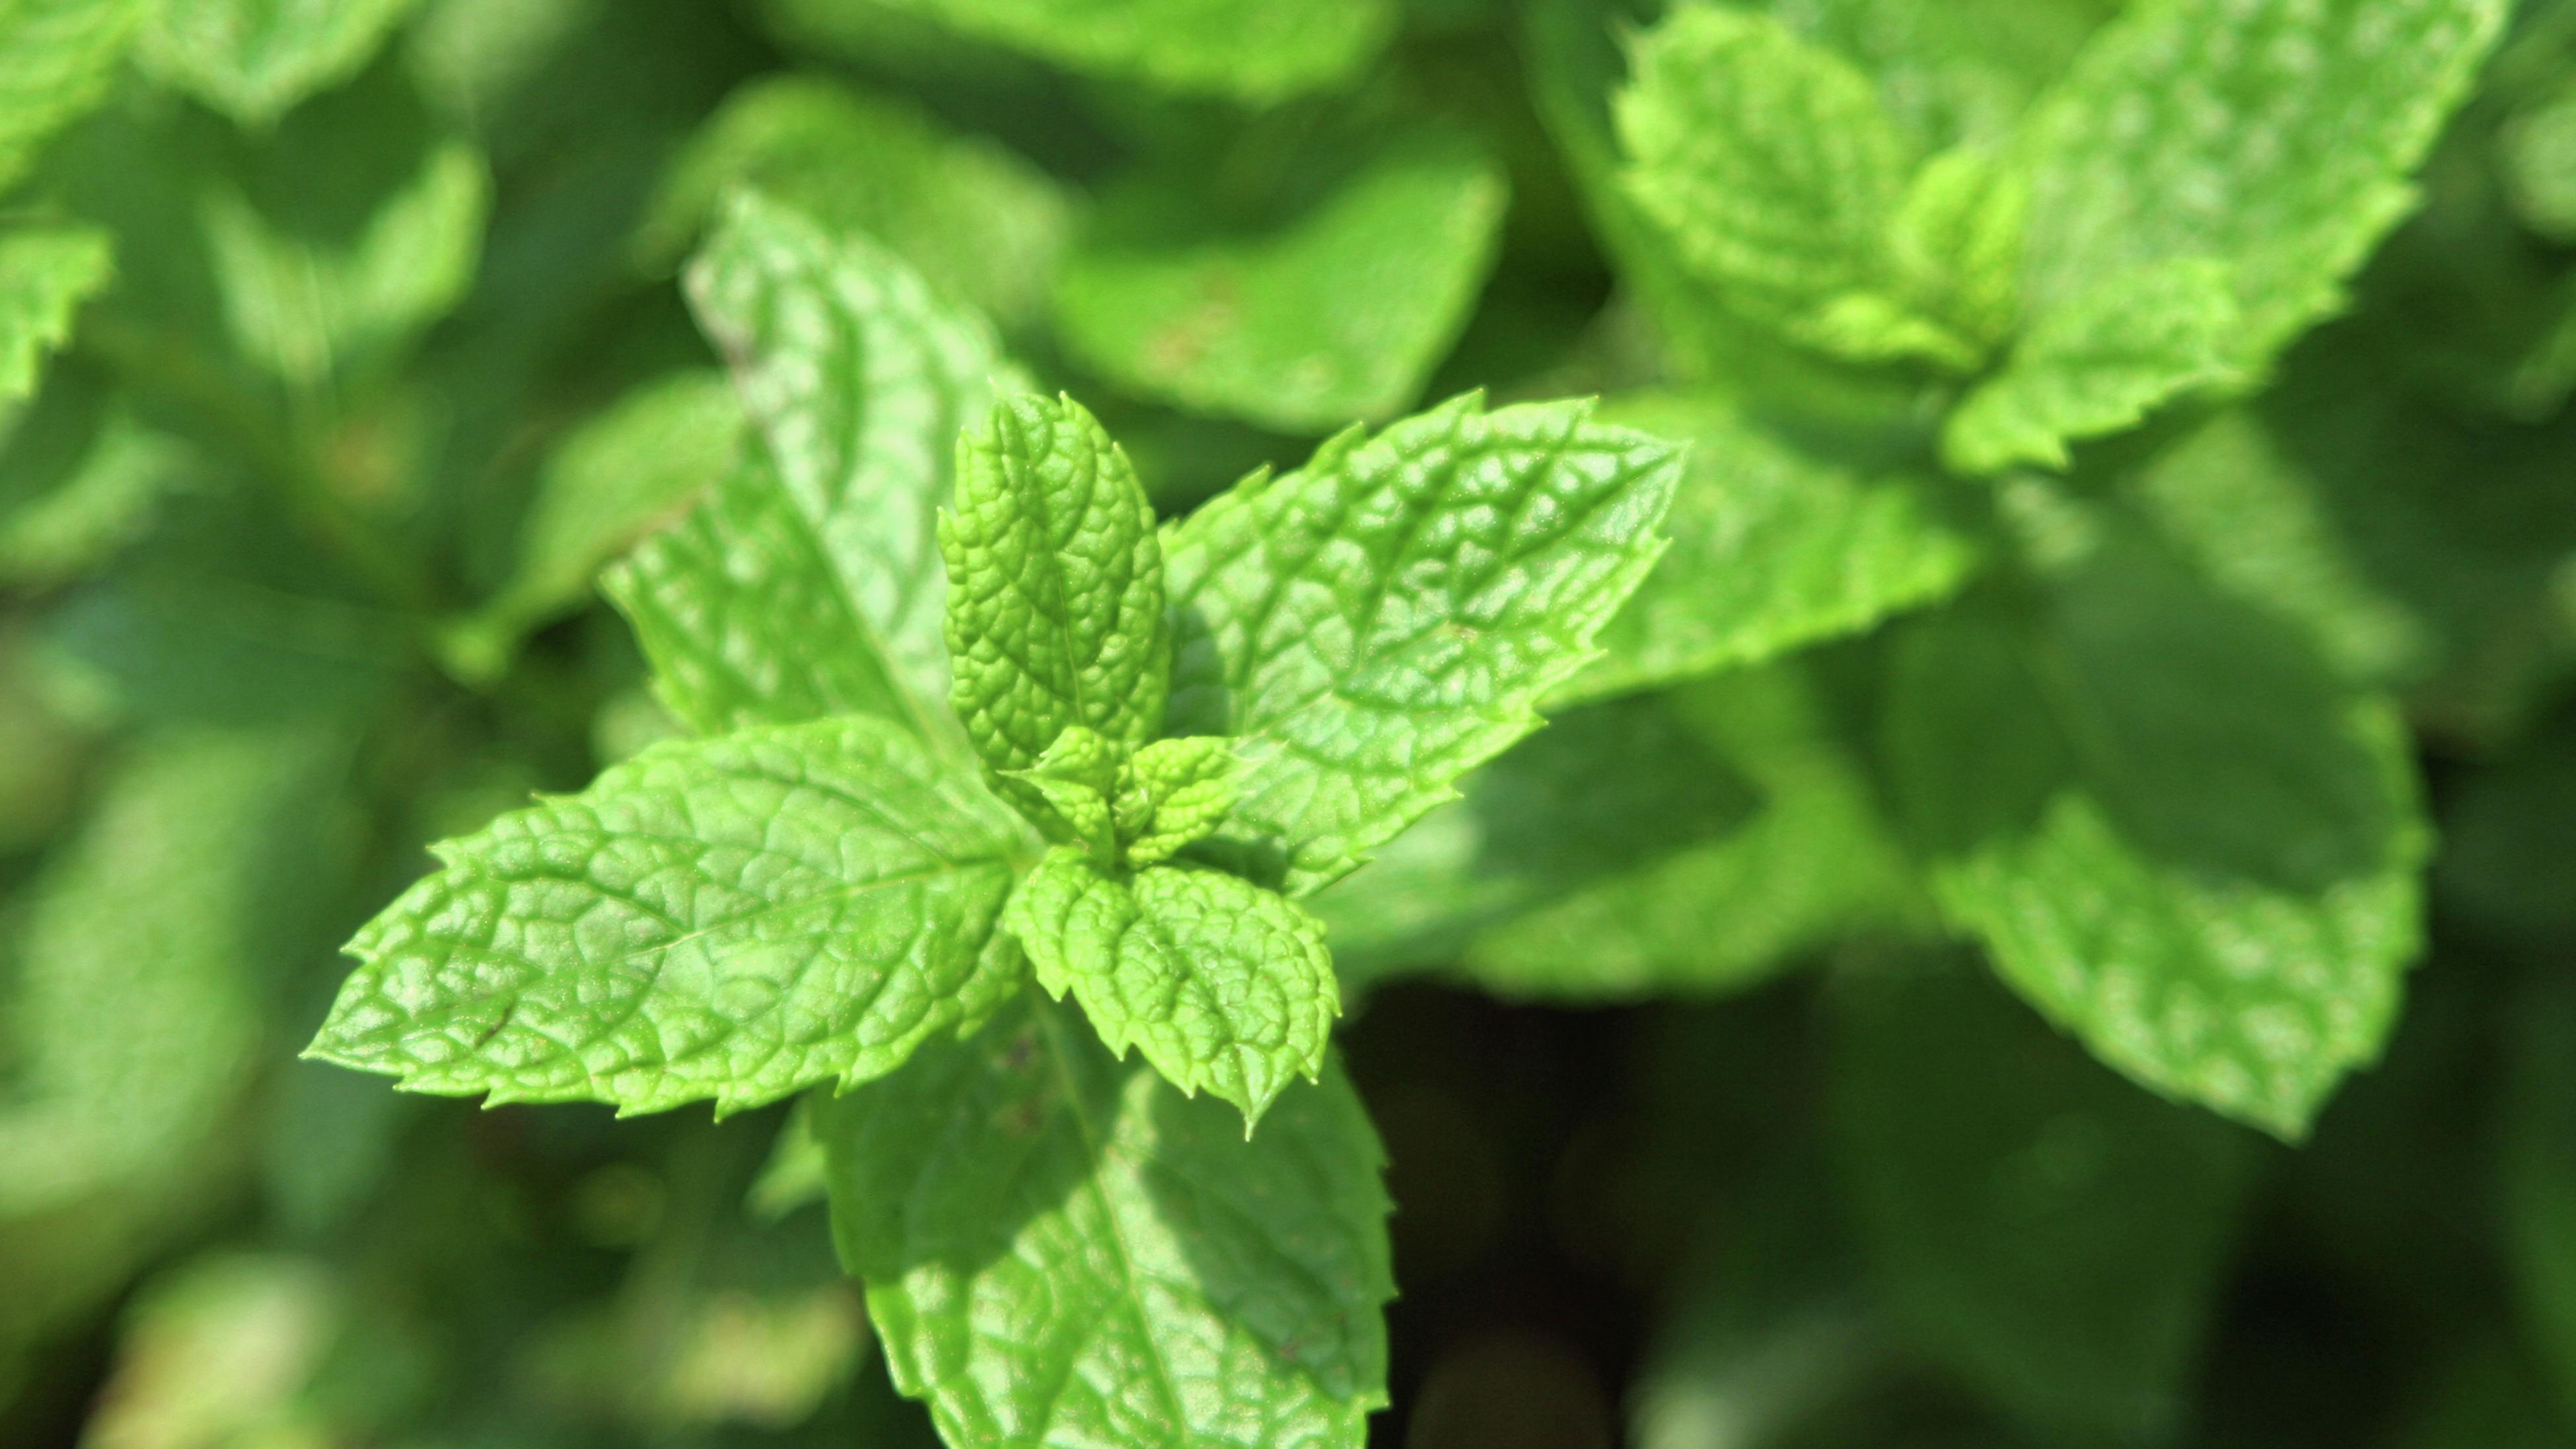 close up of a mint plant